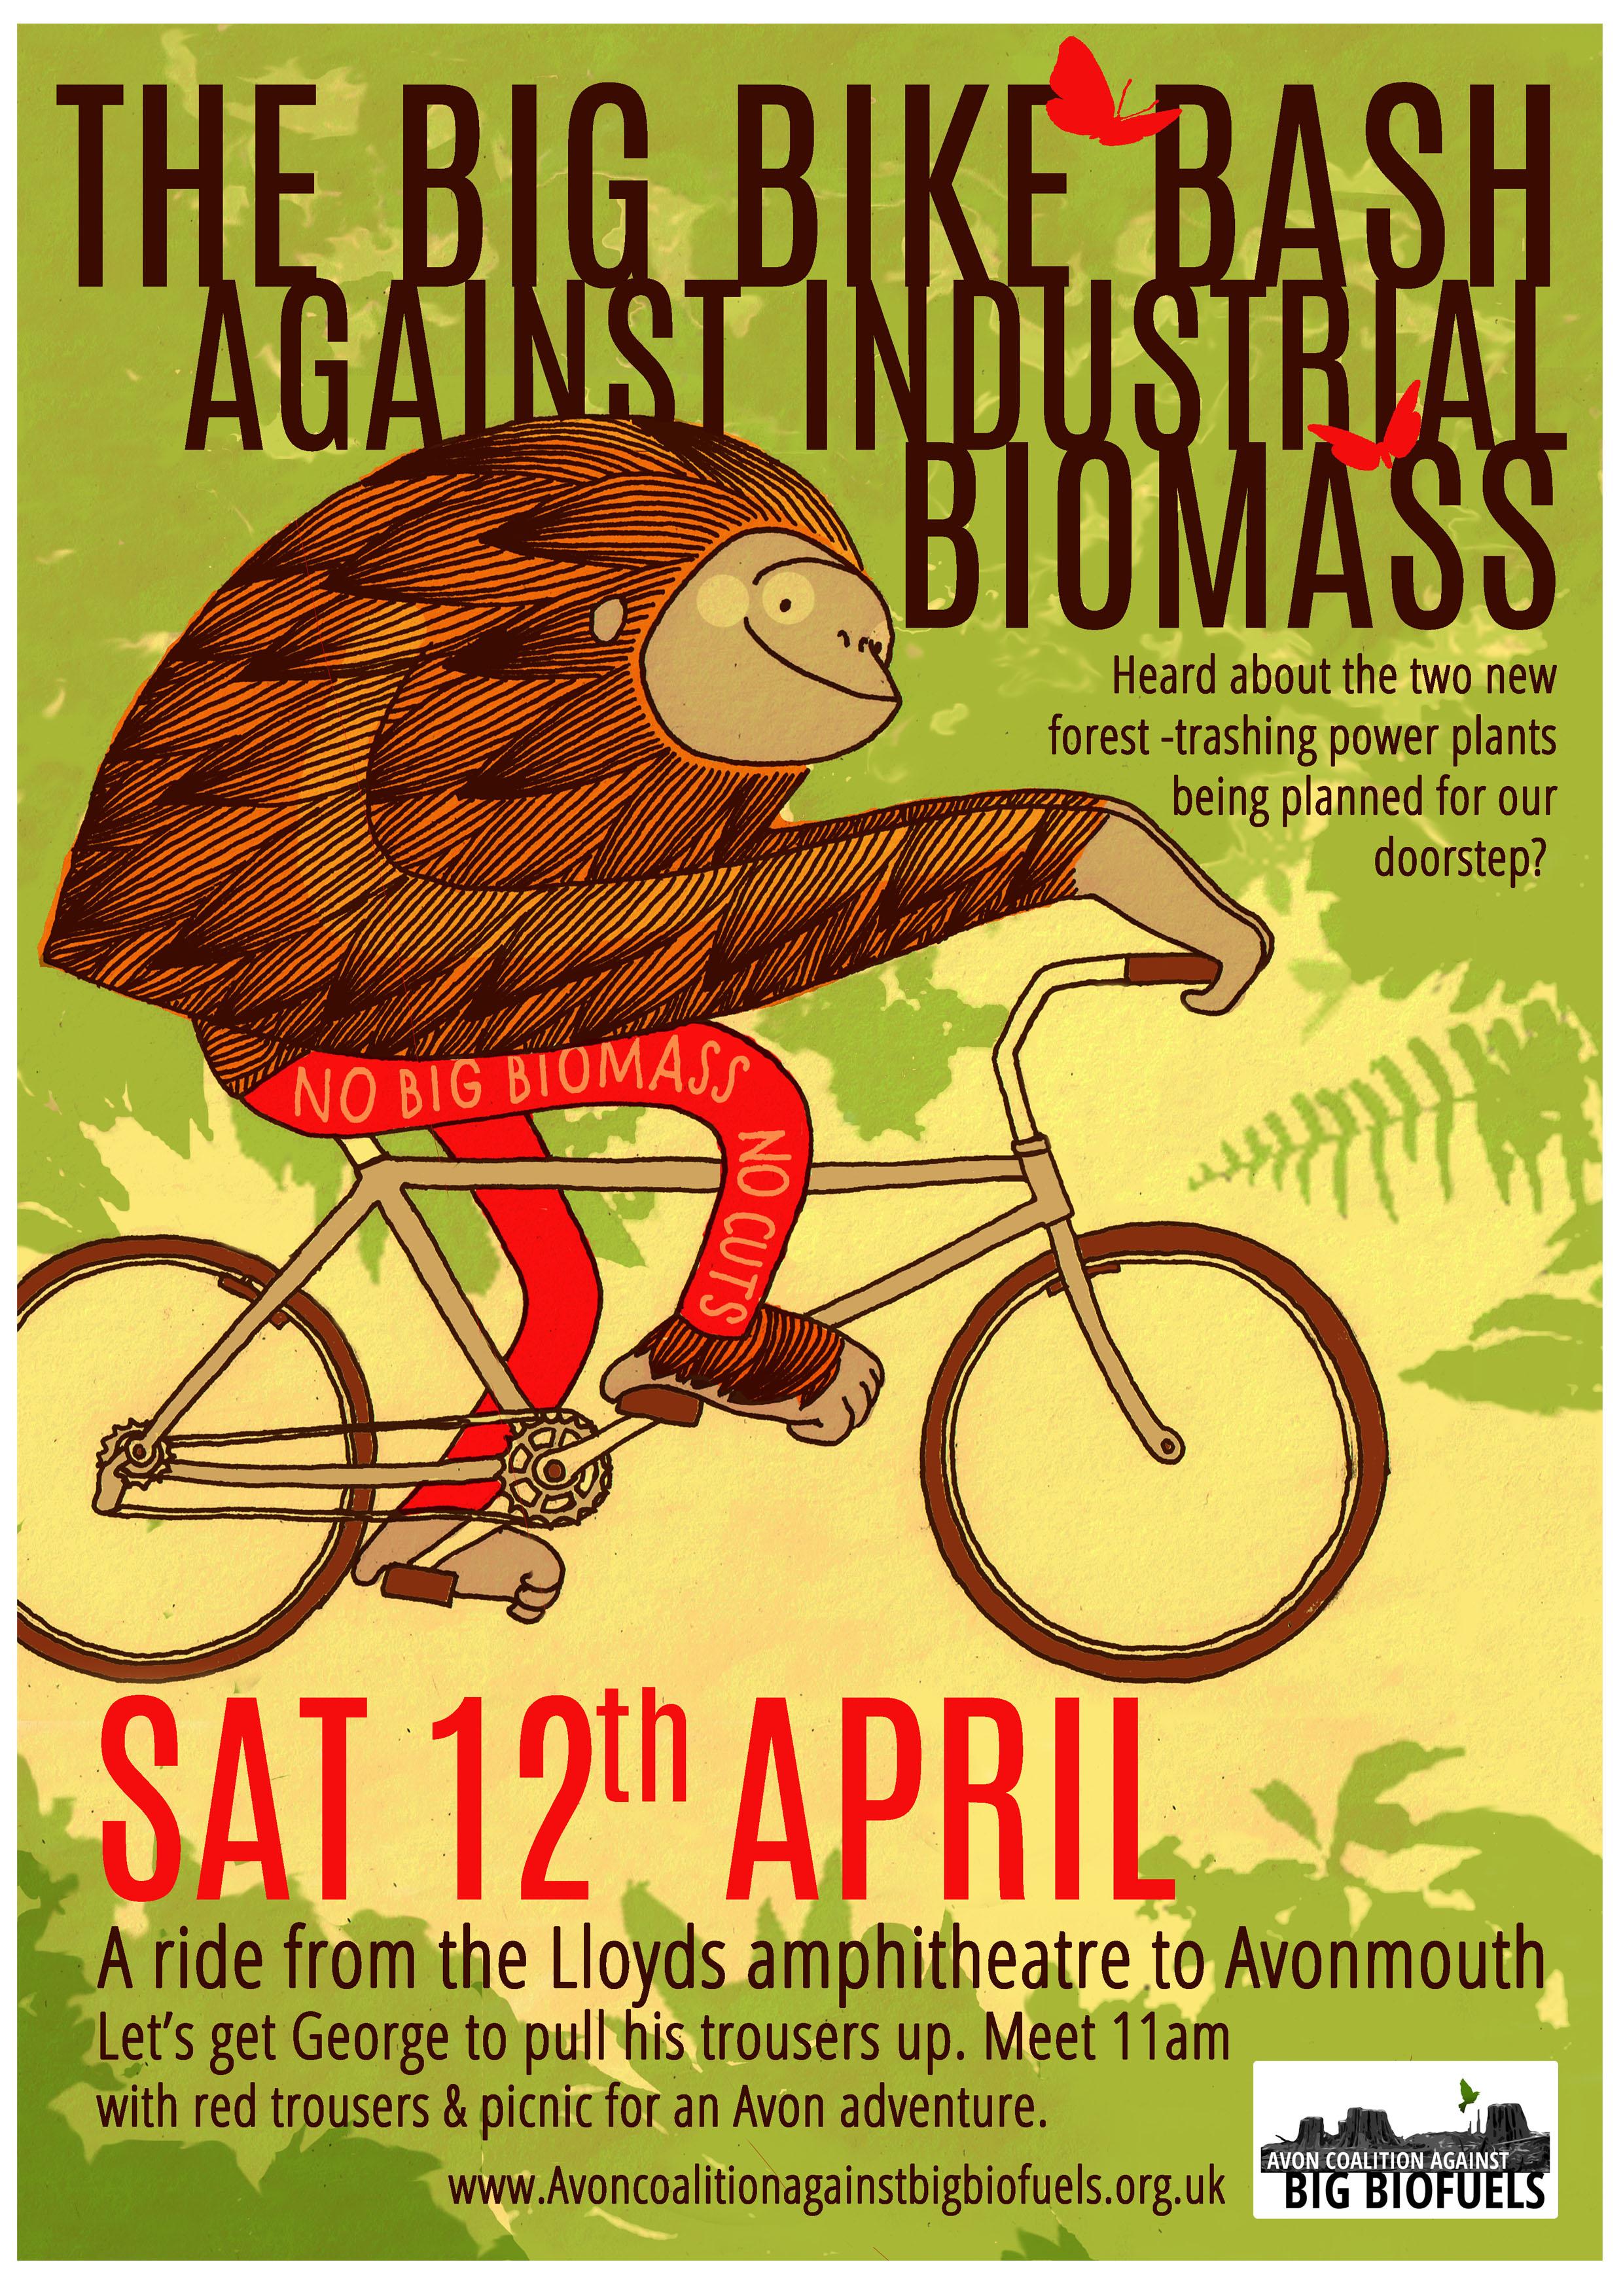 Big Bike Bash Against Industrial Biomass This Saturday 12th April 11am Start Lloyds Ampitheatre